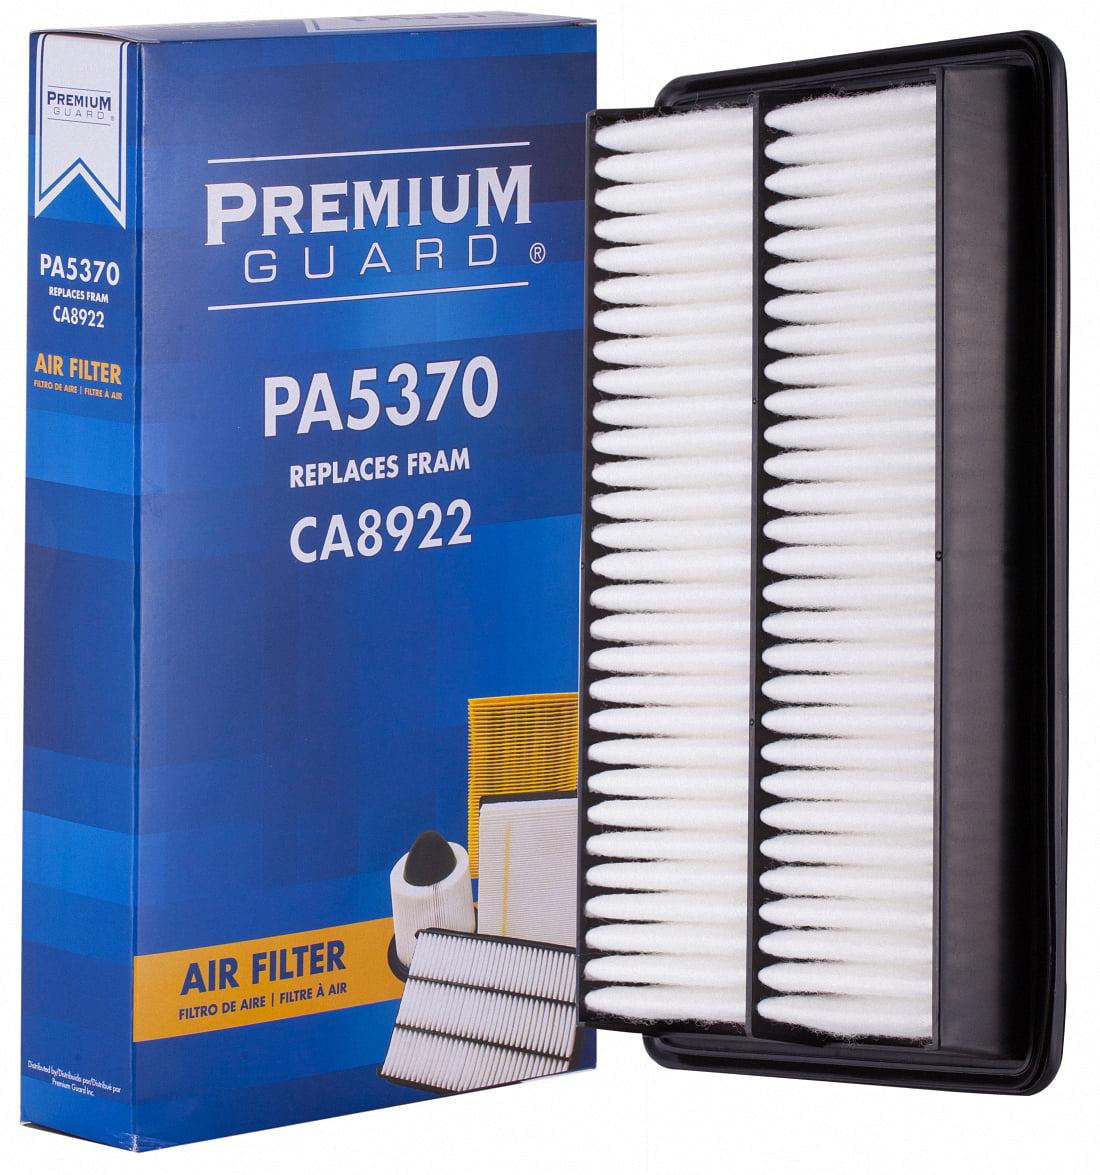 Premium Guard PC5480 Cabin Air Filter